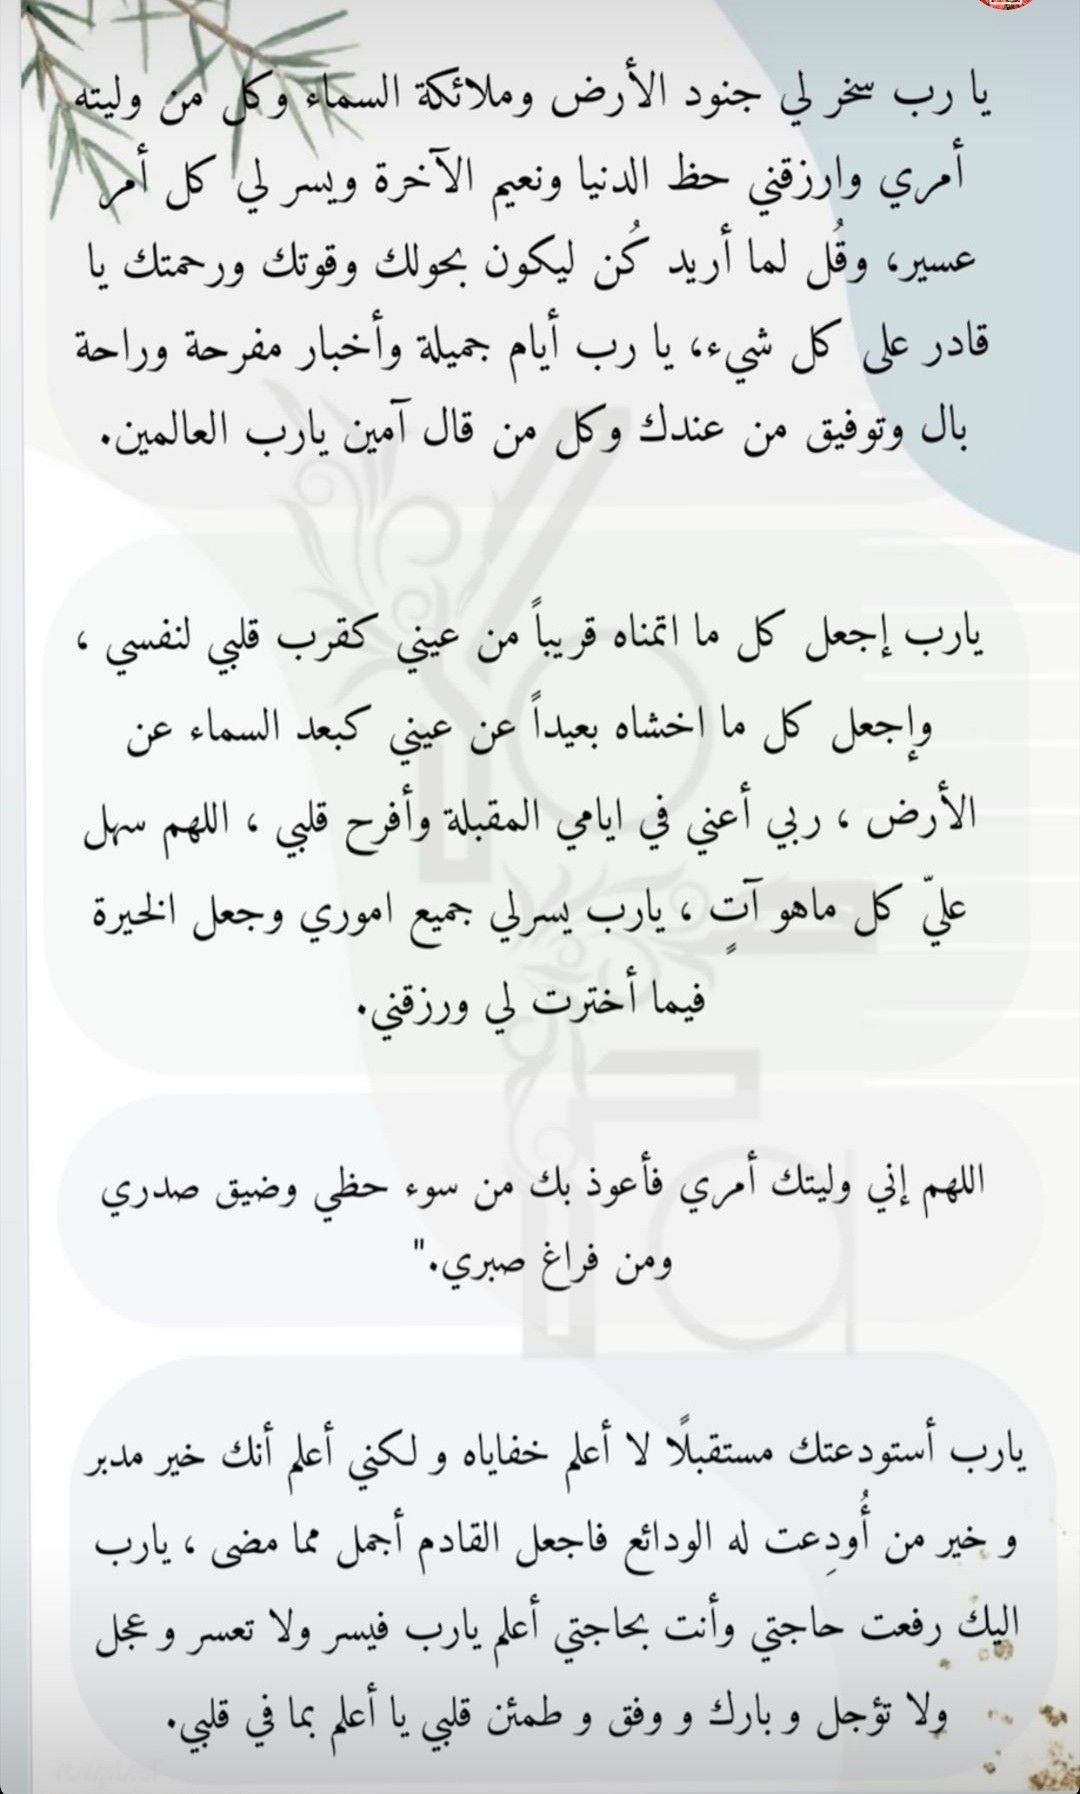 Pin By Um Alhasan On اسلاميات قرآن أحاديث دعاء همسات ايمانية Arabic Calligraphy Painting Beautiful Arabic Words Arabic Words